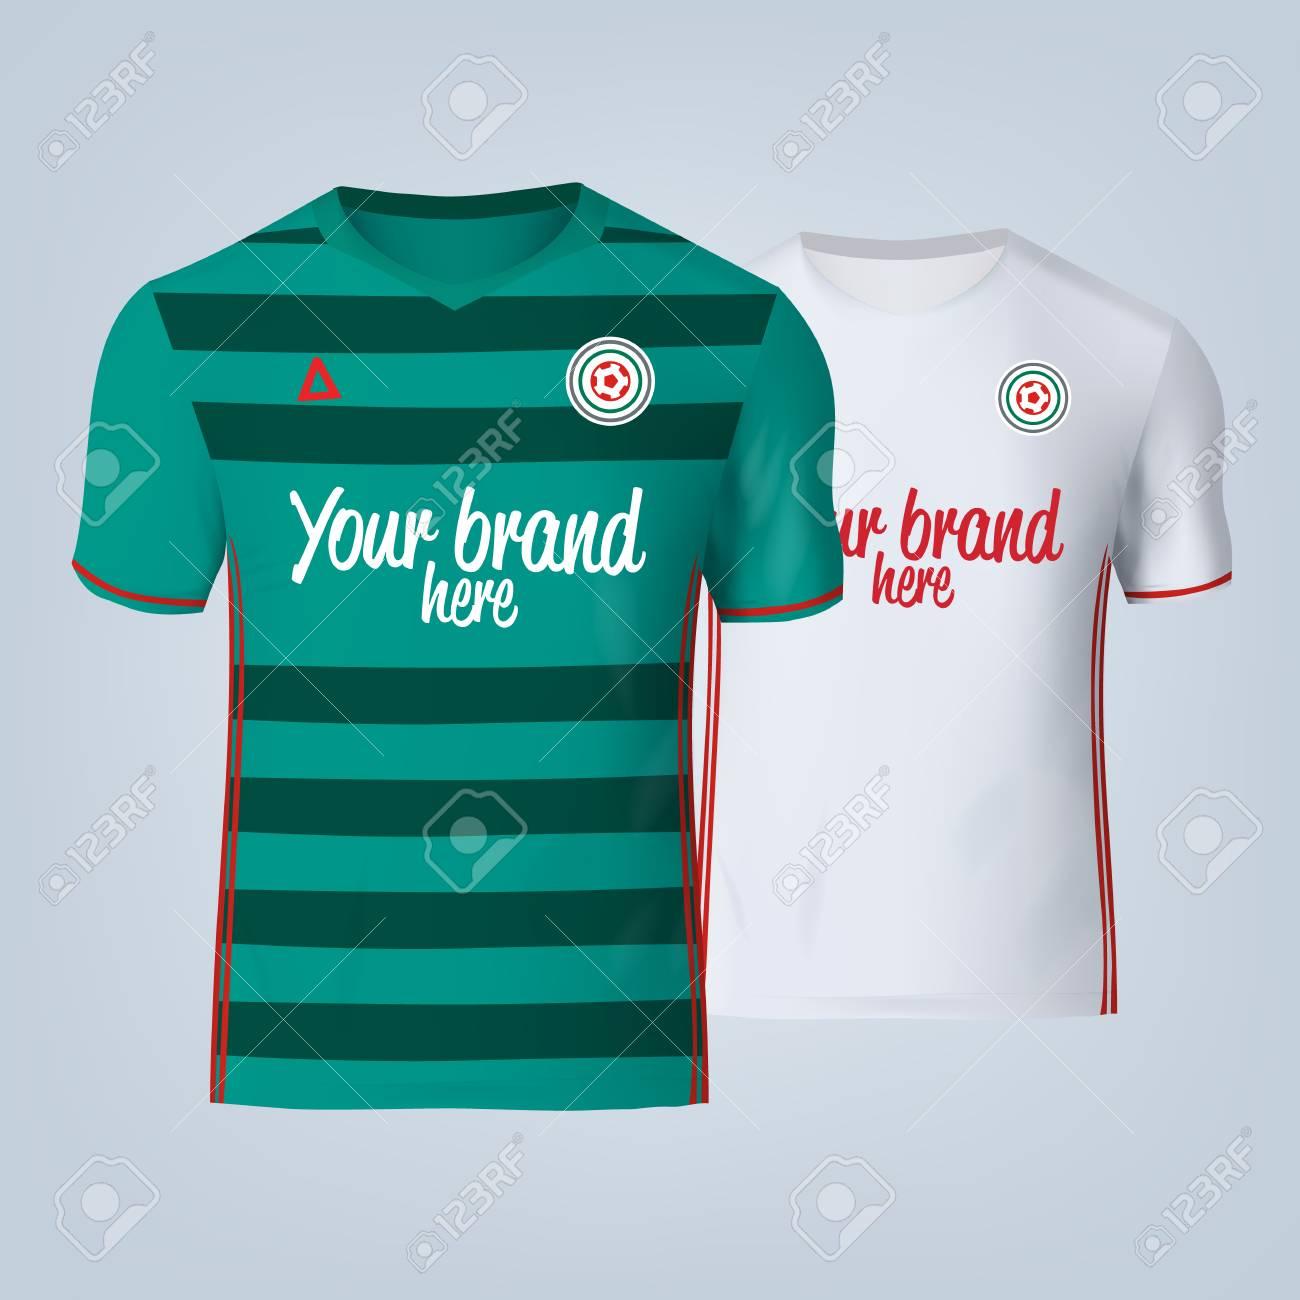 Vector illustration of football t-shirt template. - 84013143